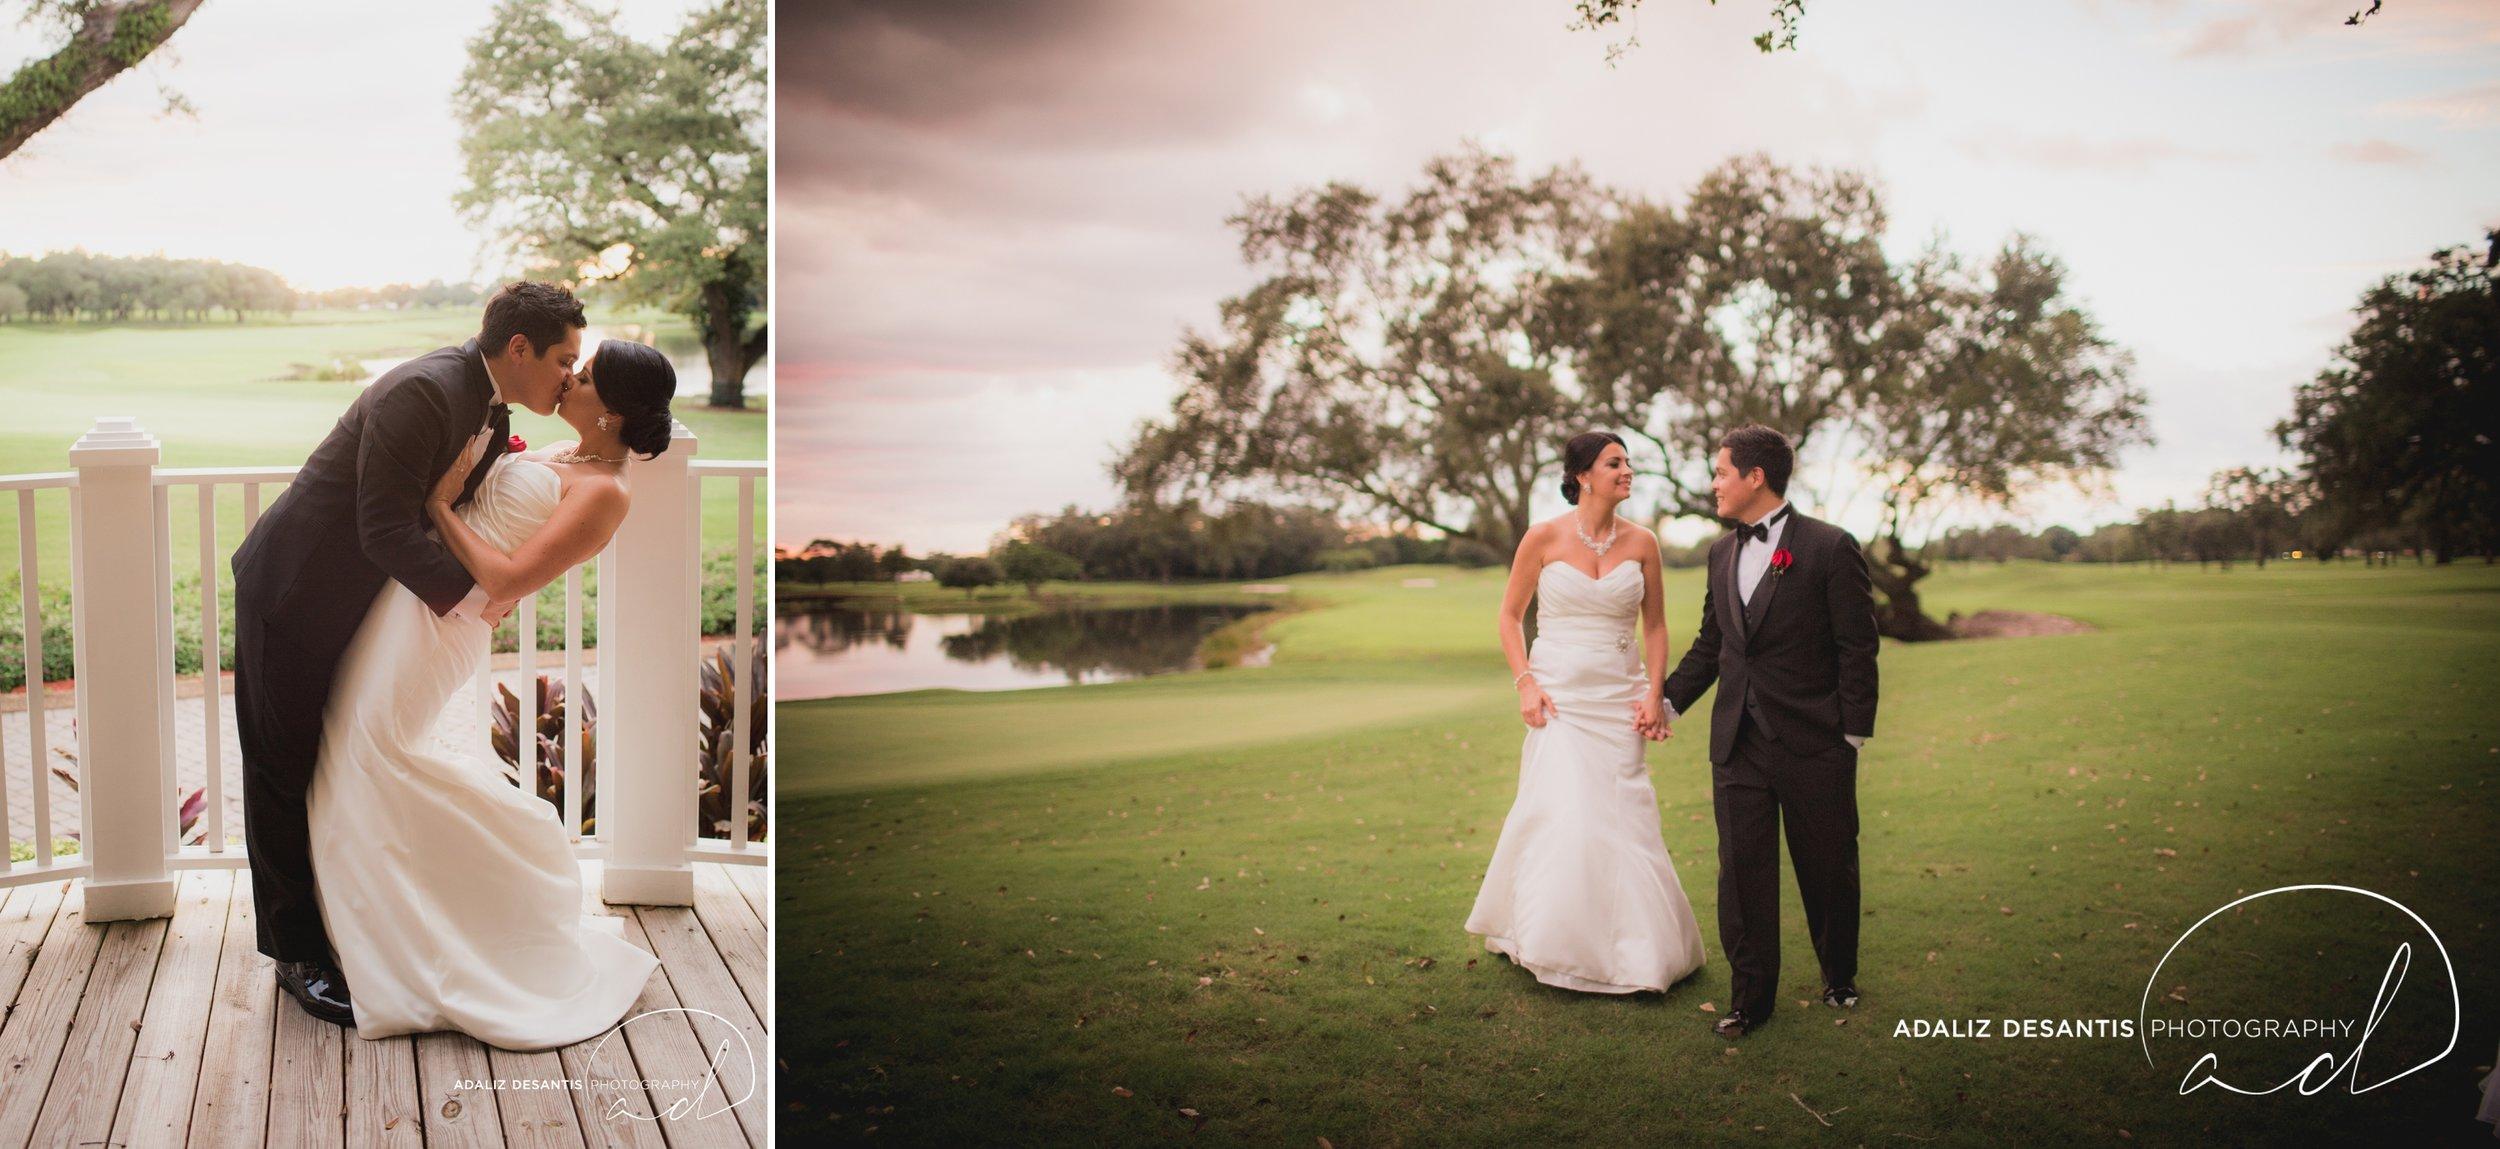 grande oaks golf club davie wedding saint david catholic church black red white south florida wedding photographer documentary photojournalistic 40.jpg